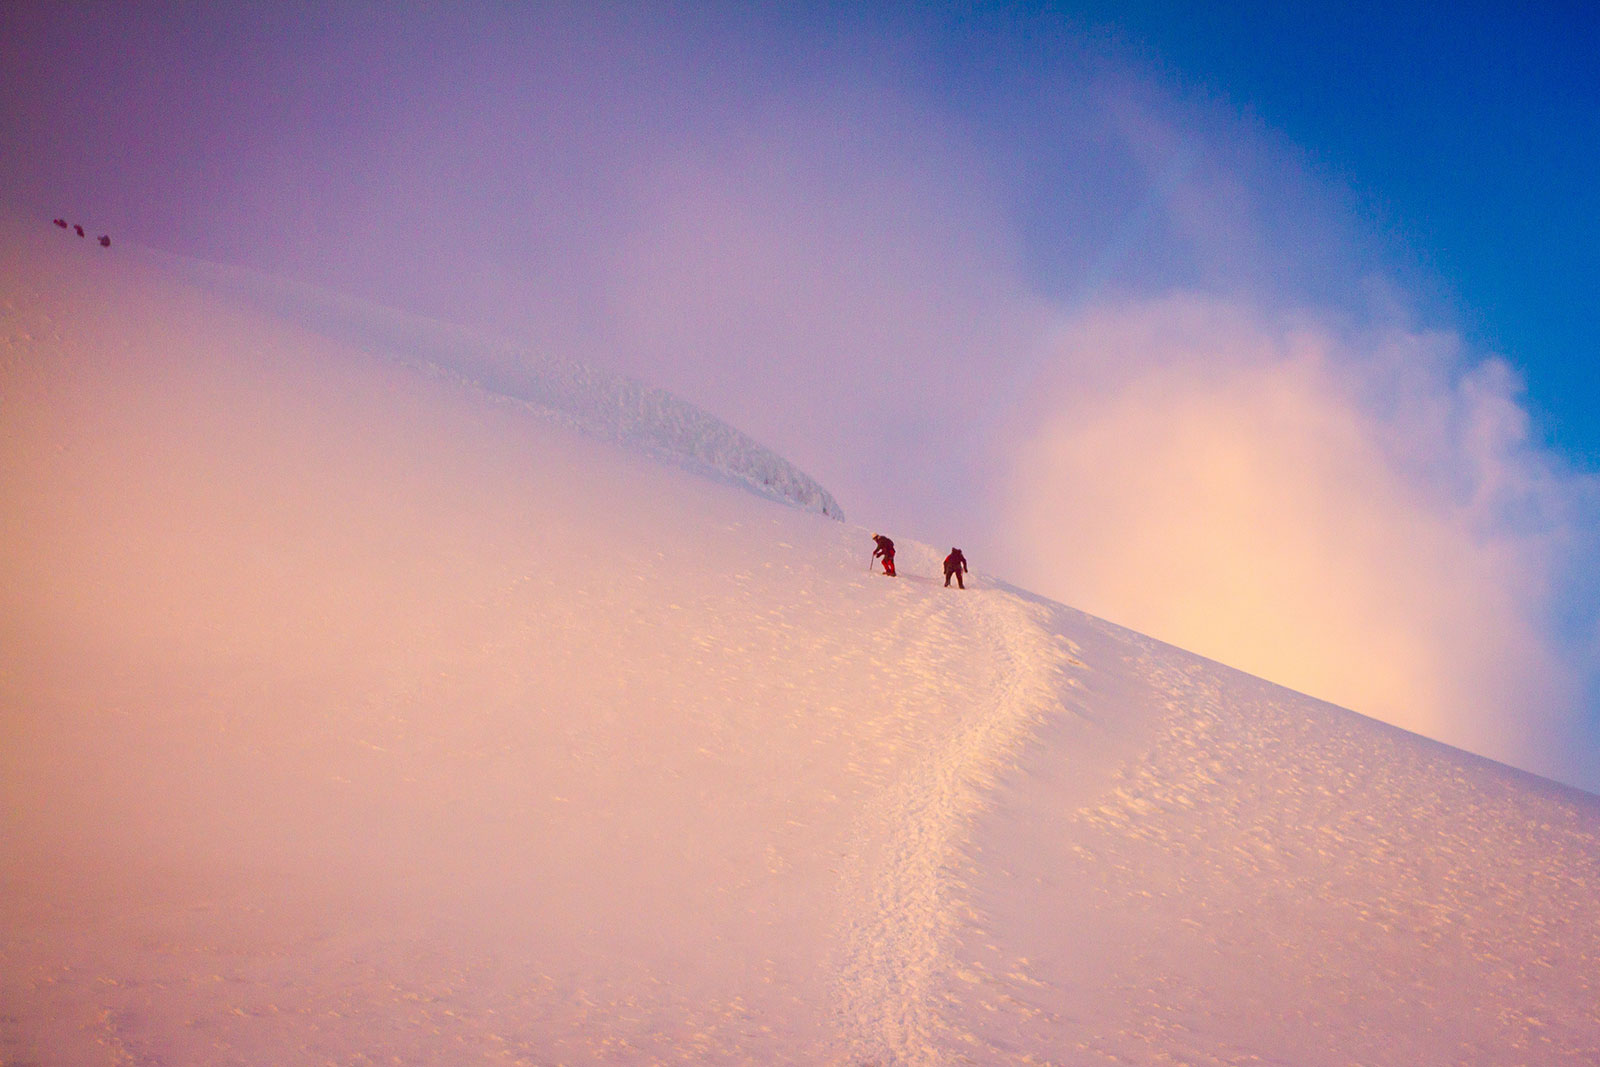 The perks of an alpine start: Joaquin Andino and Adam Moszynski soak up Cotopaxi's first light. [Photo] TJ David